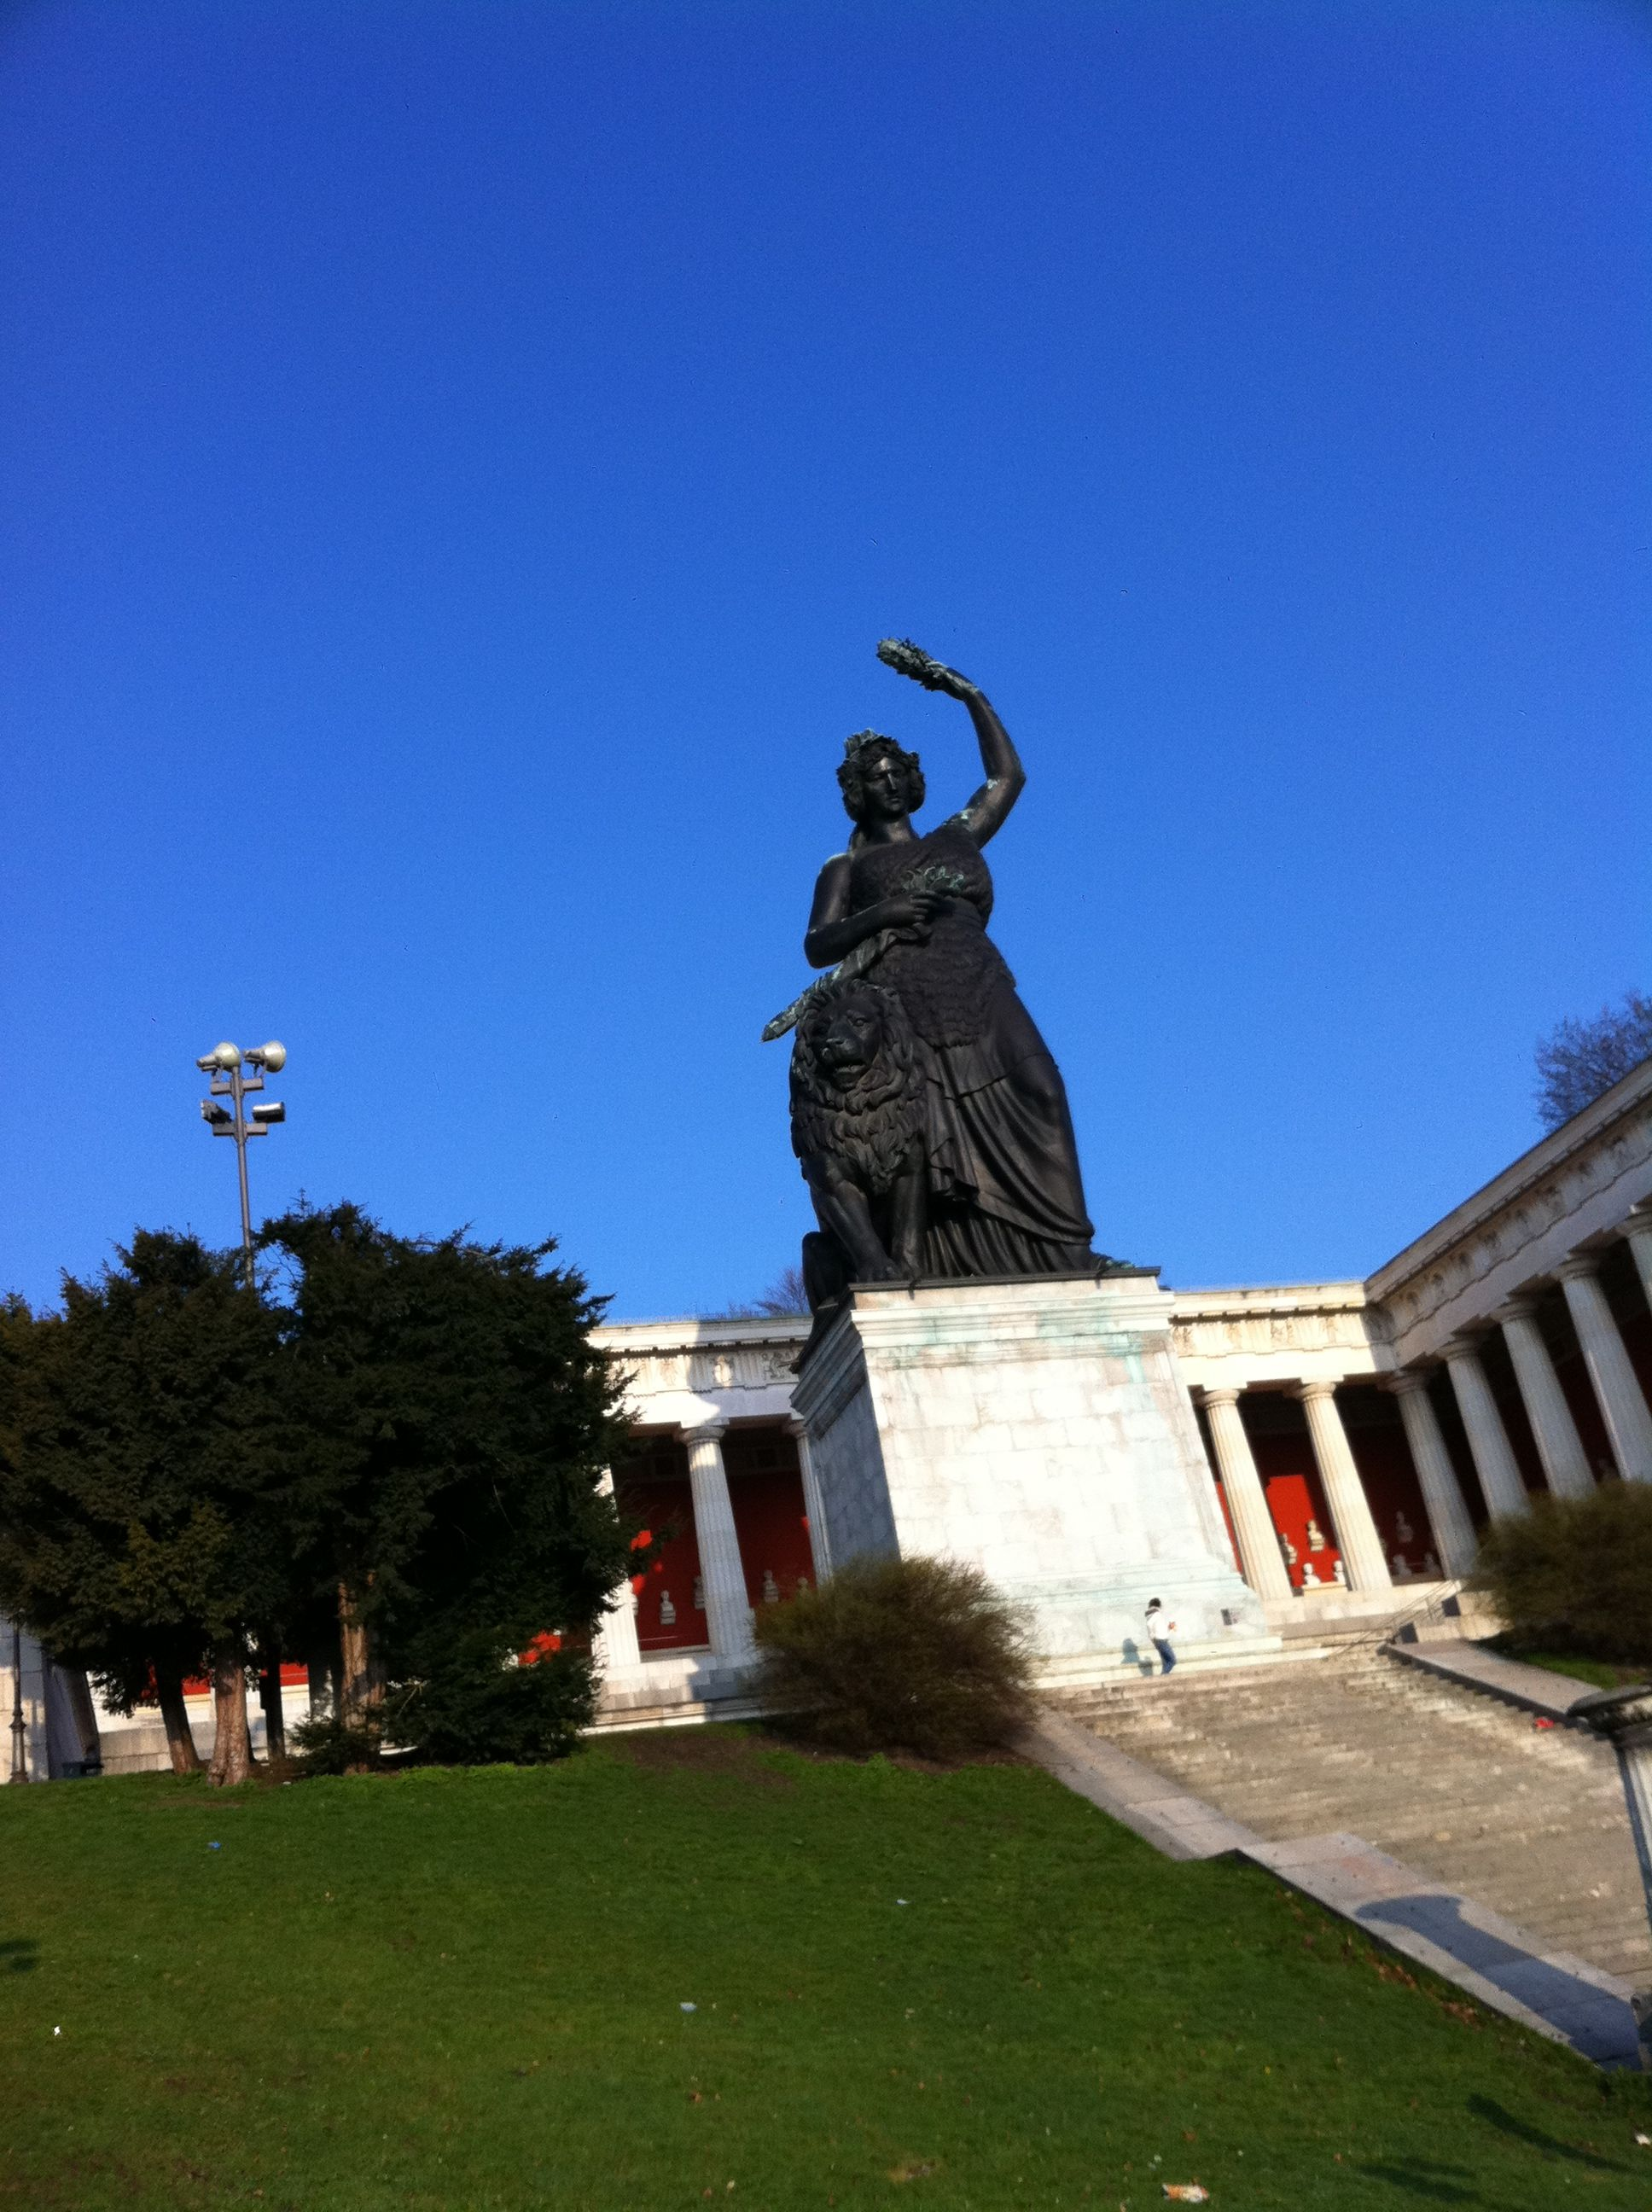 Oktoberfest, Bavaria Statue, Iconic, Large, Monument